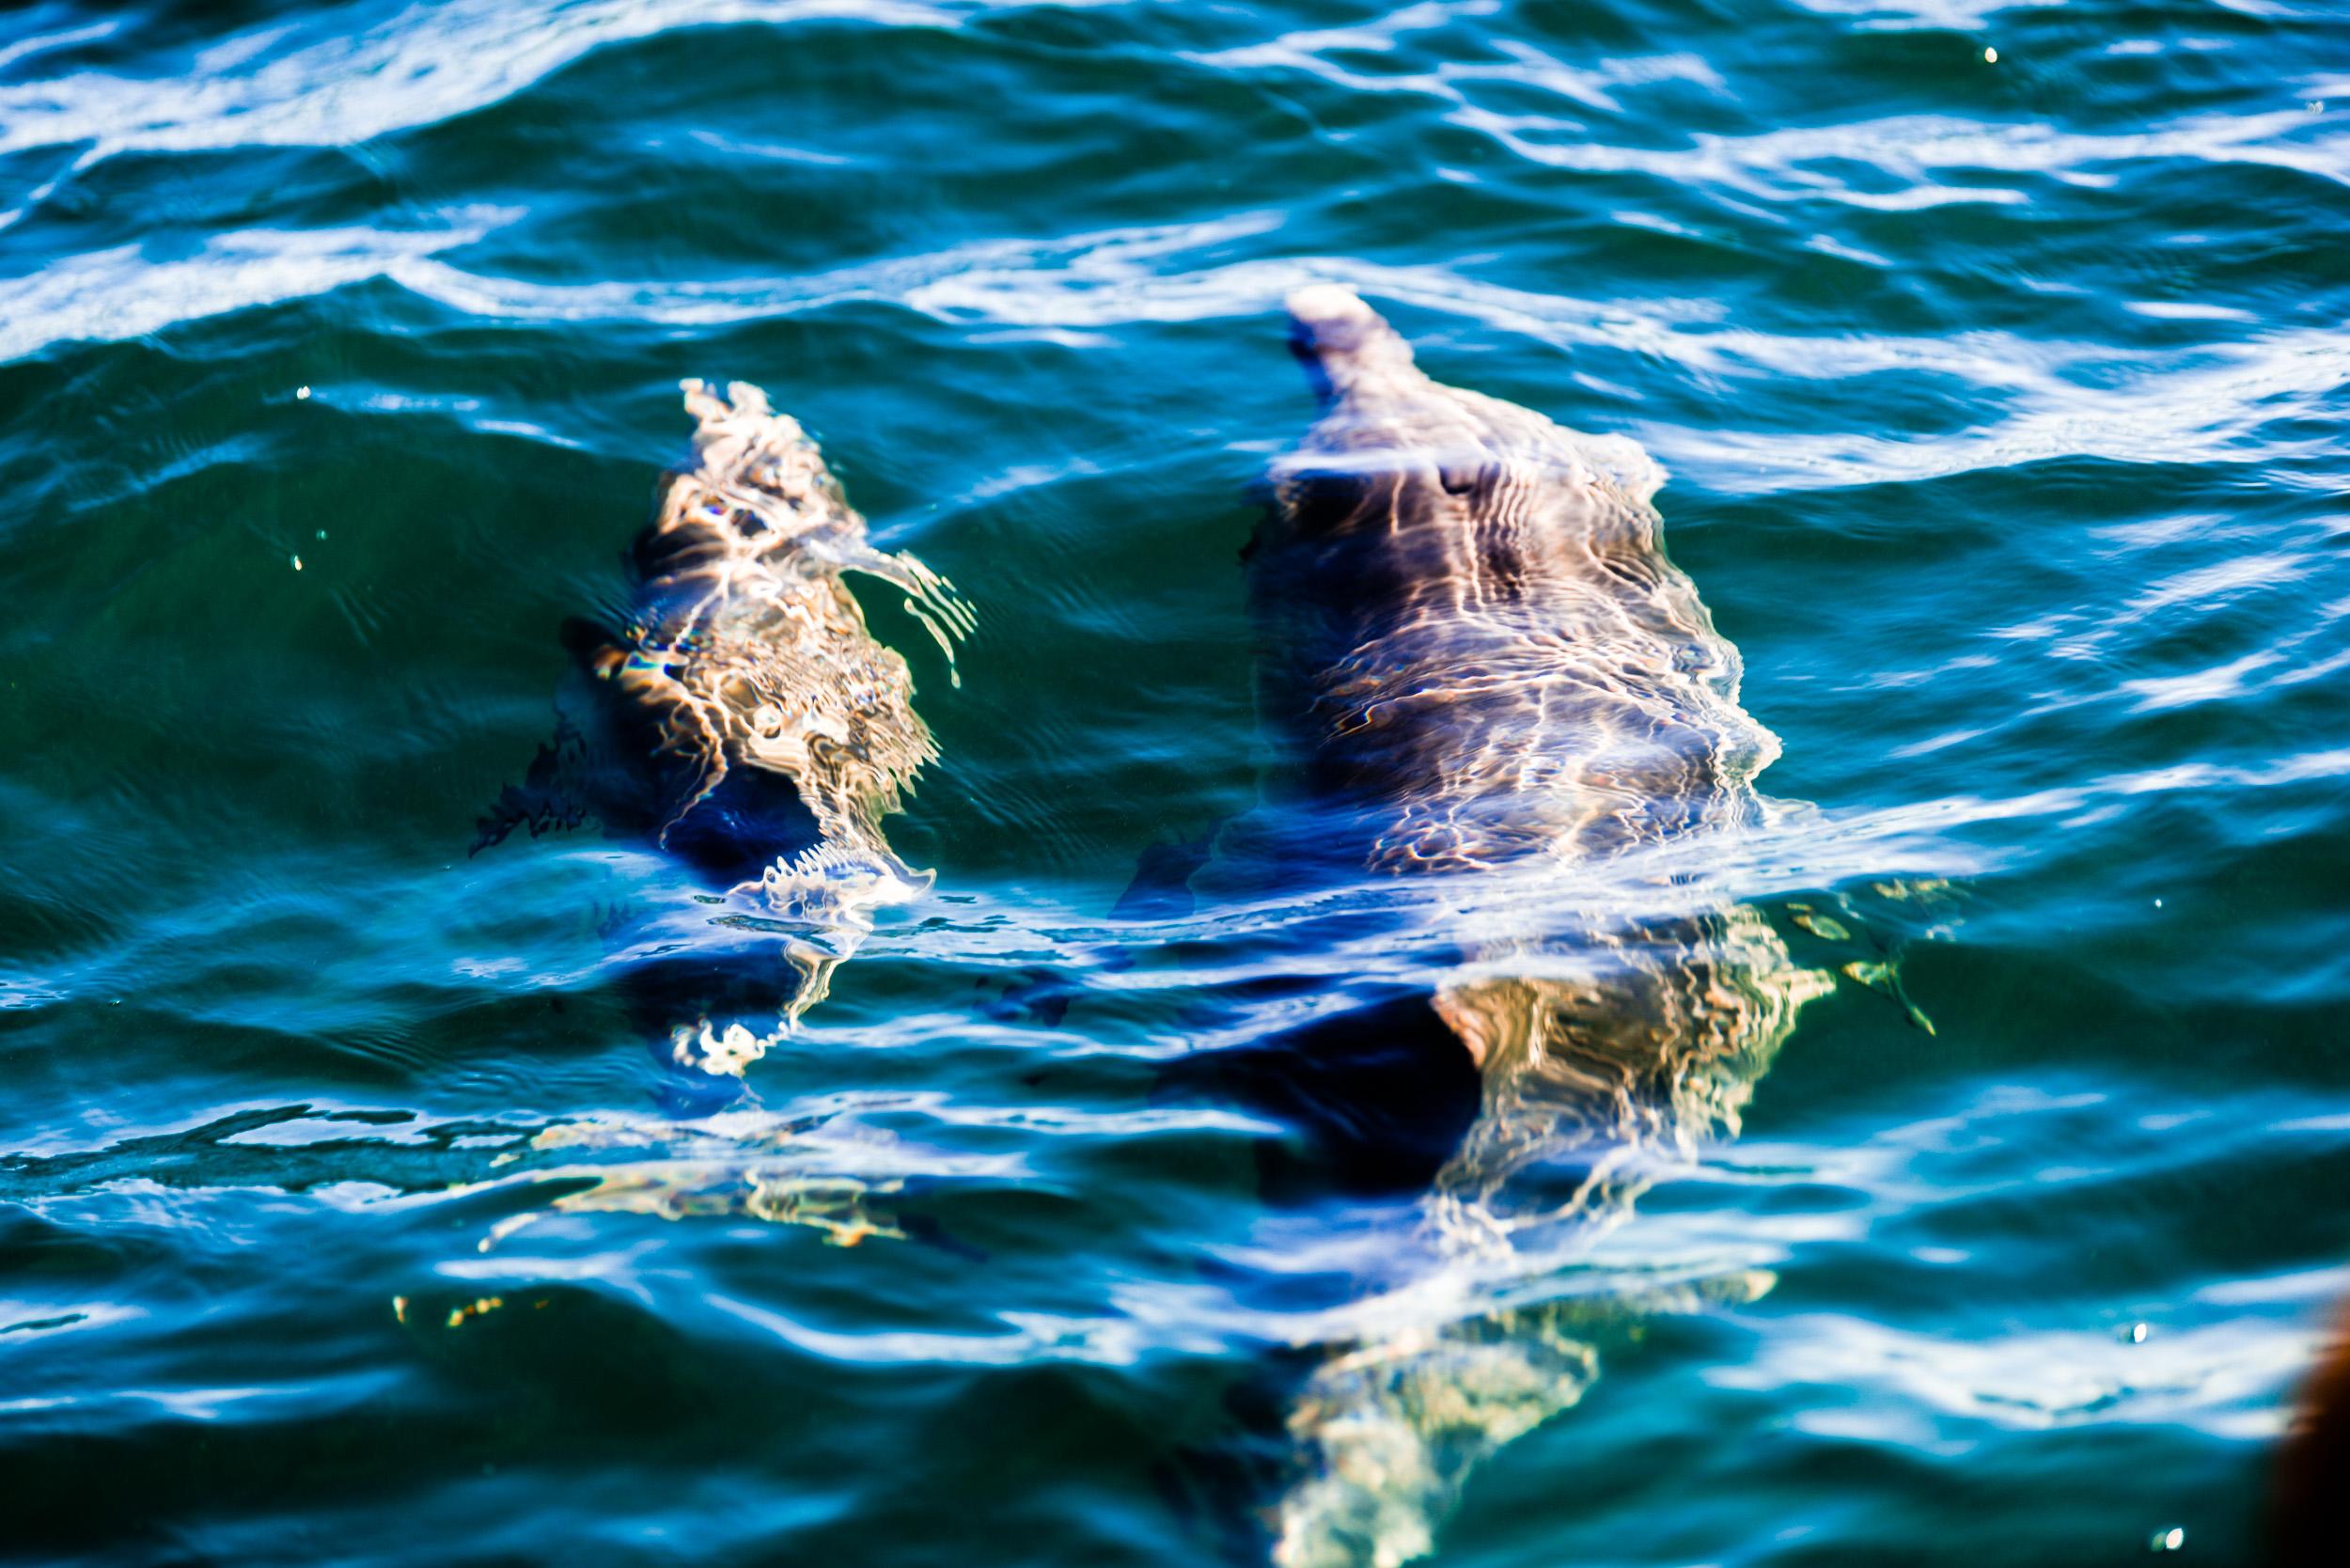 Spyrides_Kyle_Dolphin_Swimming_Rockingham_DSC2749.jpg